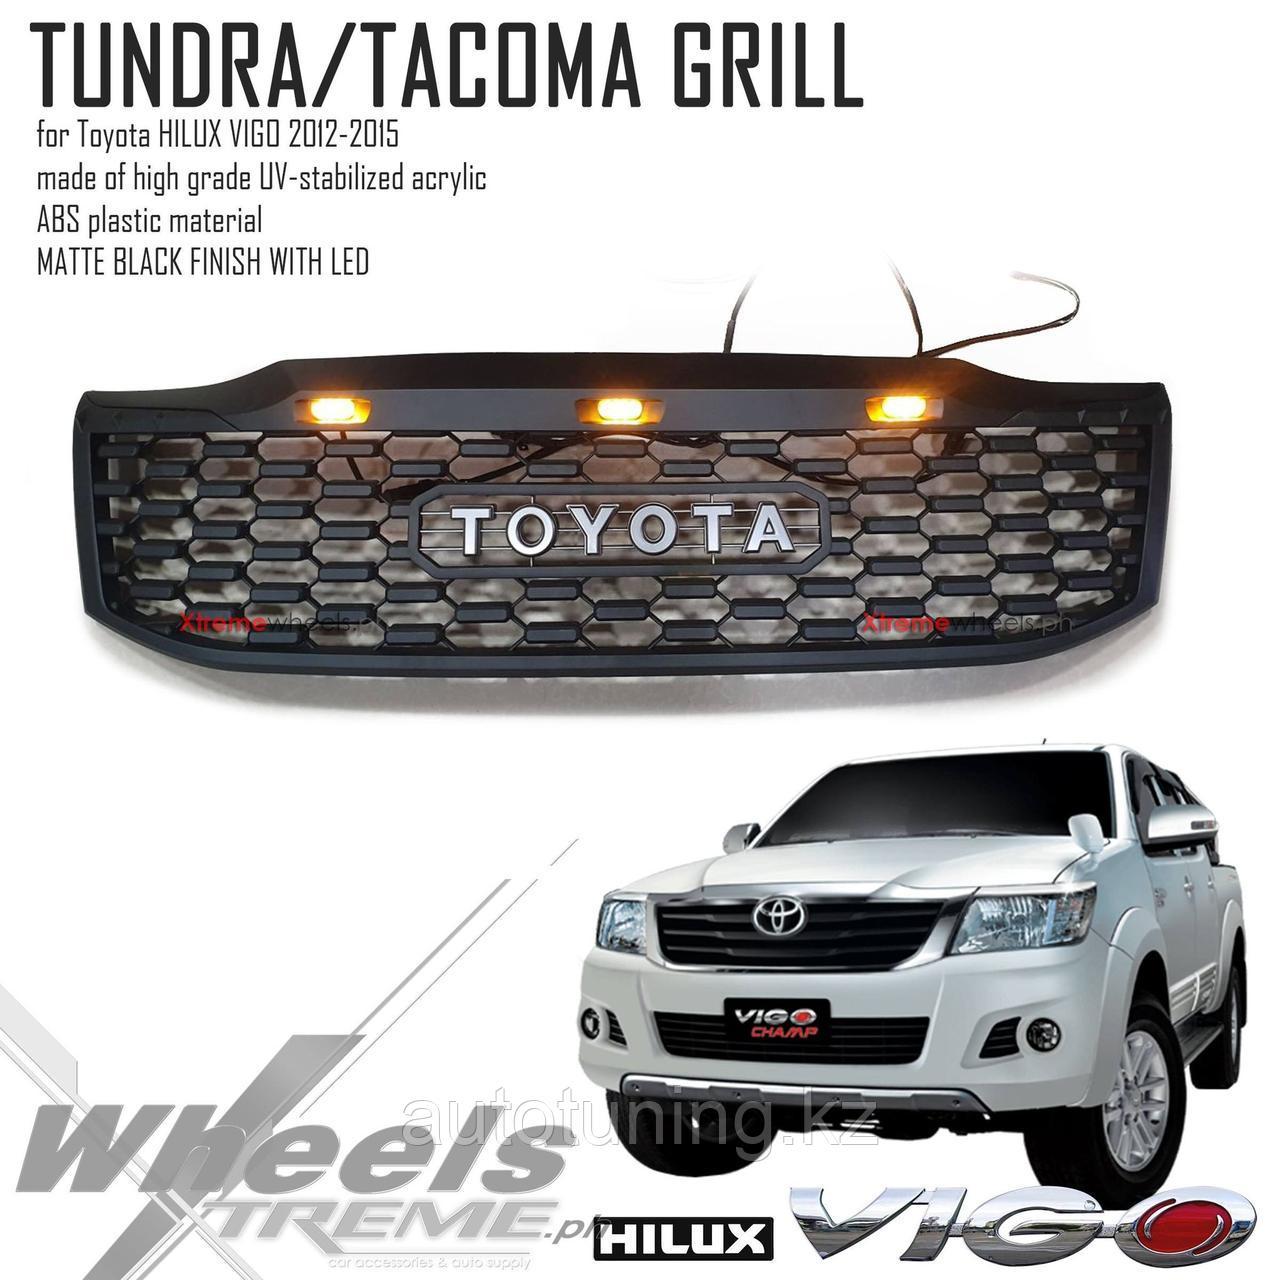 Решетка радиатора на Toyota Hilux Vigo MK7 2011-2015 дизайн TUNDRA